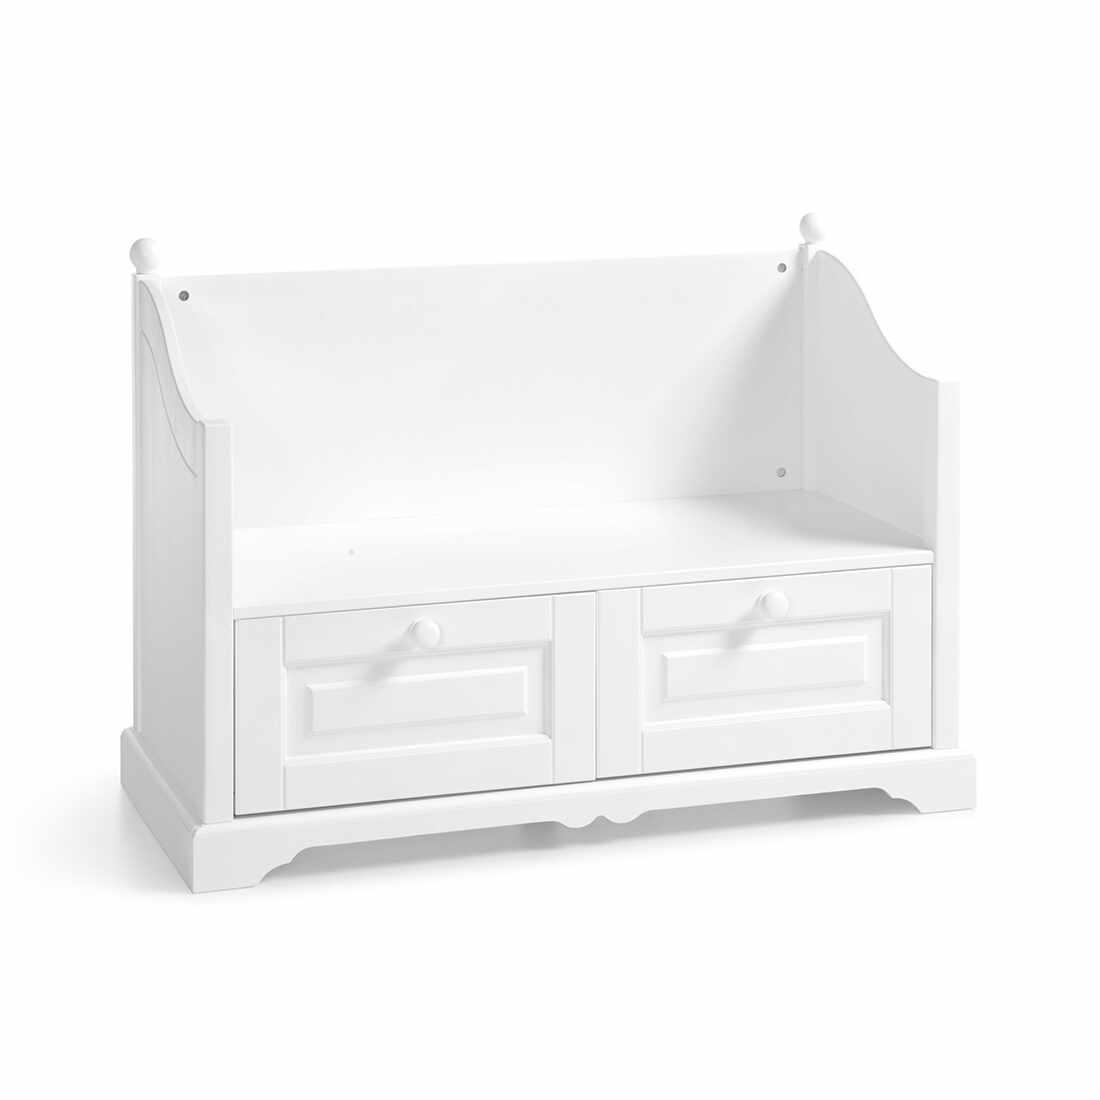 Banca din lemn de pin si pal, cu 2 sertare, pentru copii si tineret Pallas Junior Alb, l108xA48xH80 cm la pret 1434 lei